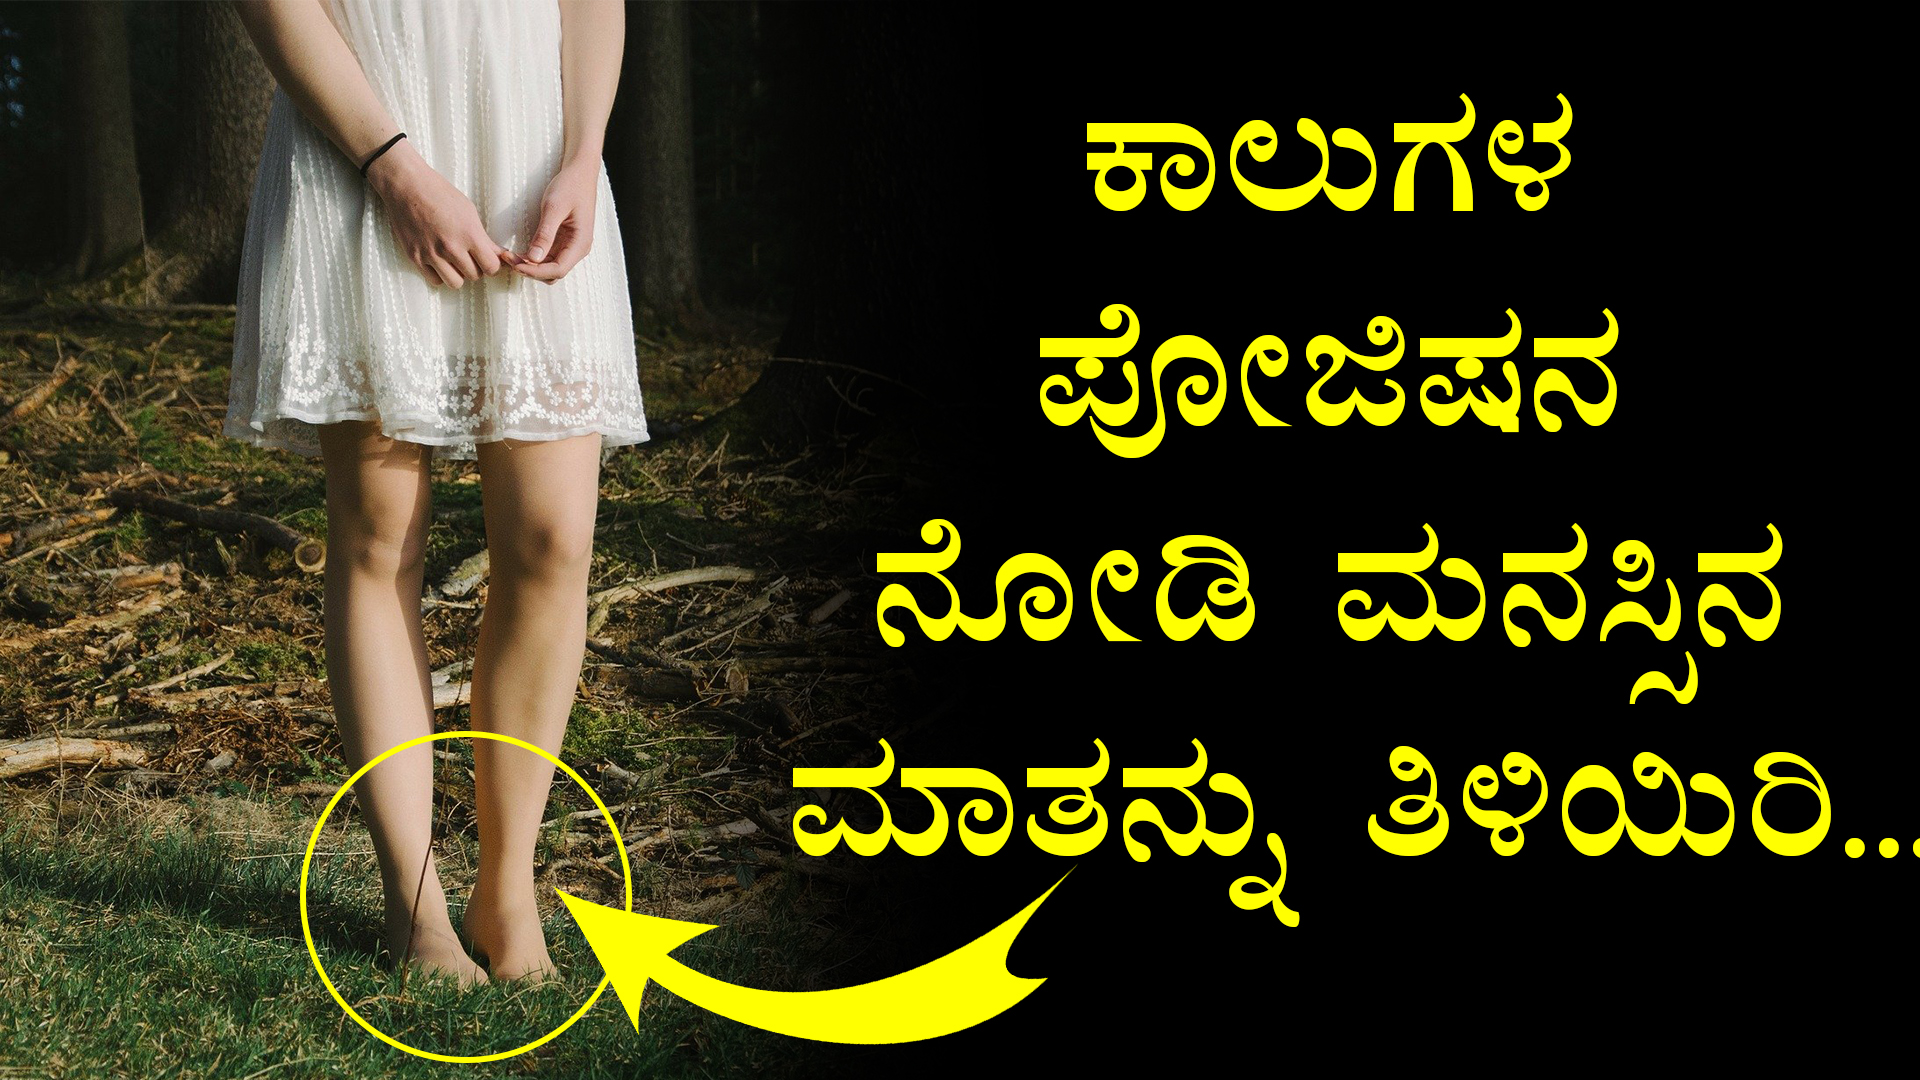 Leg & Mind Psychology & Body Language Tricks in Kannada